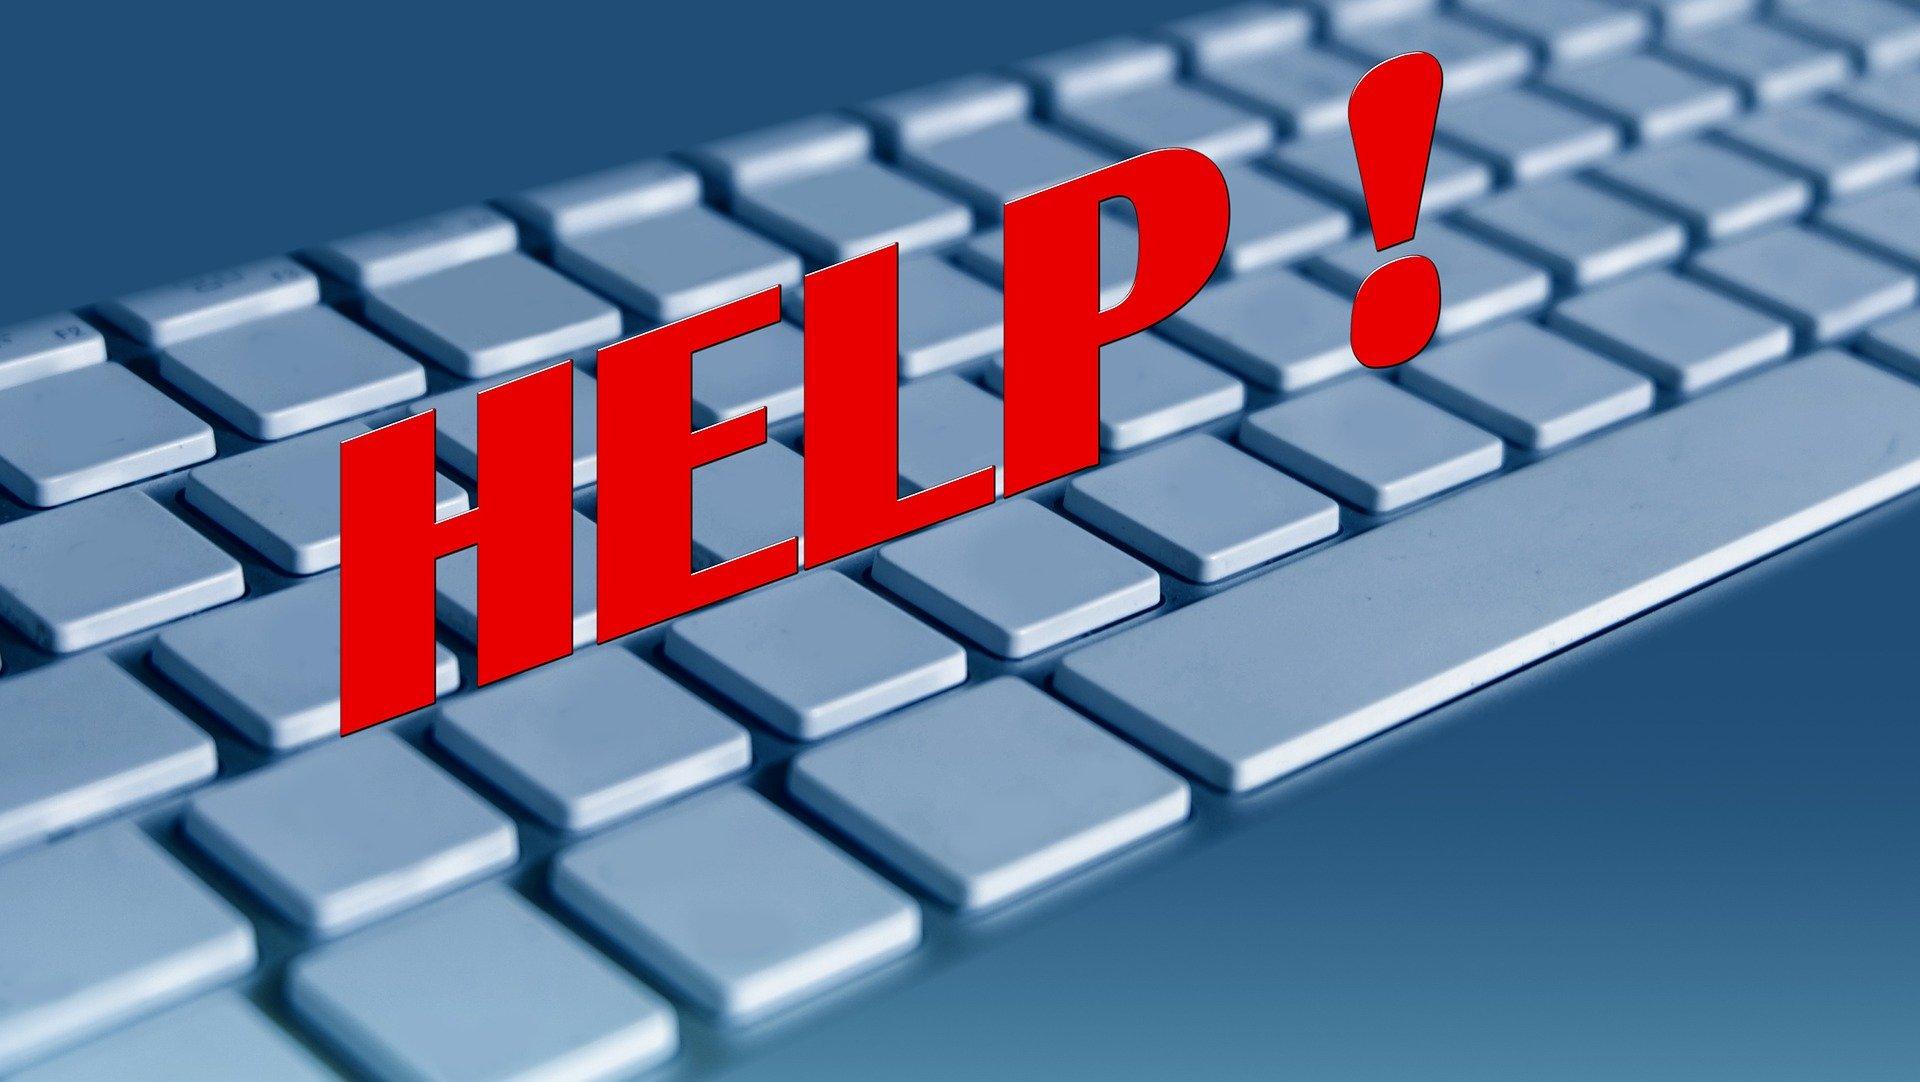 keyboard-893496_1920